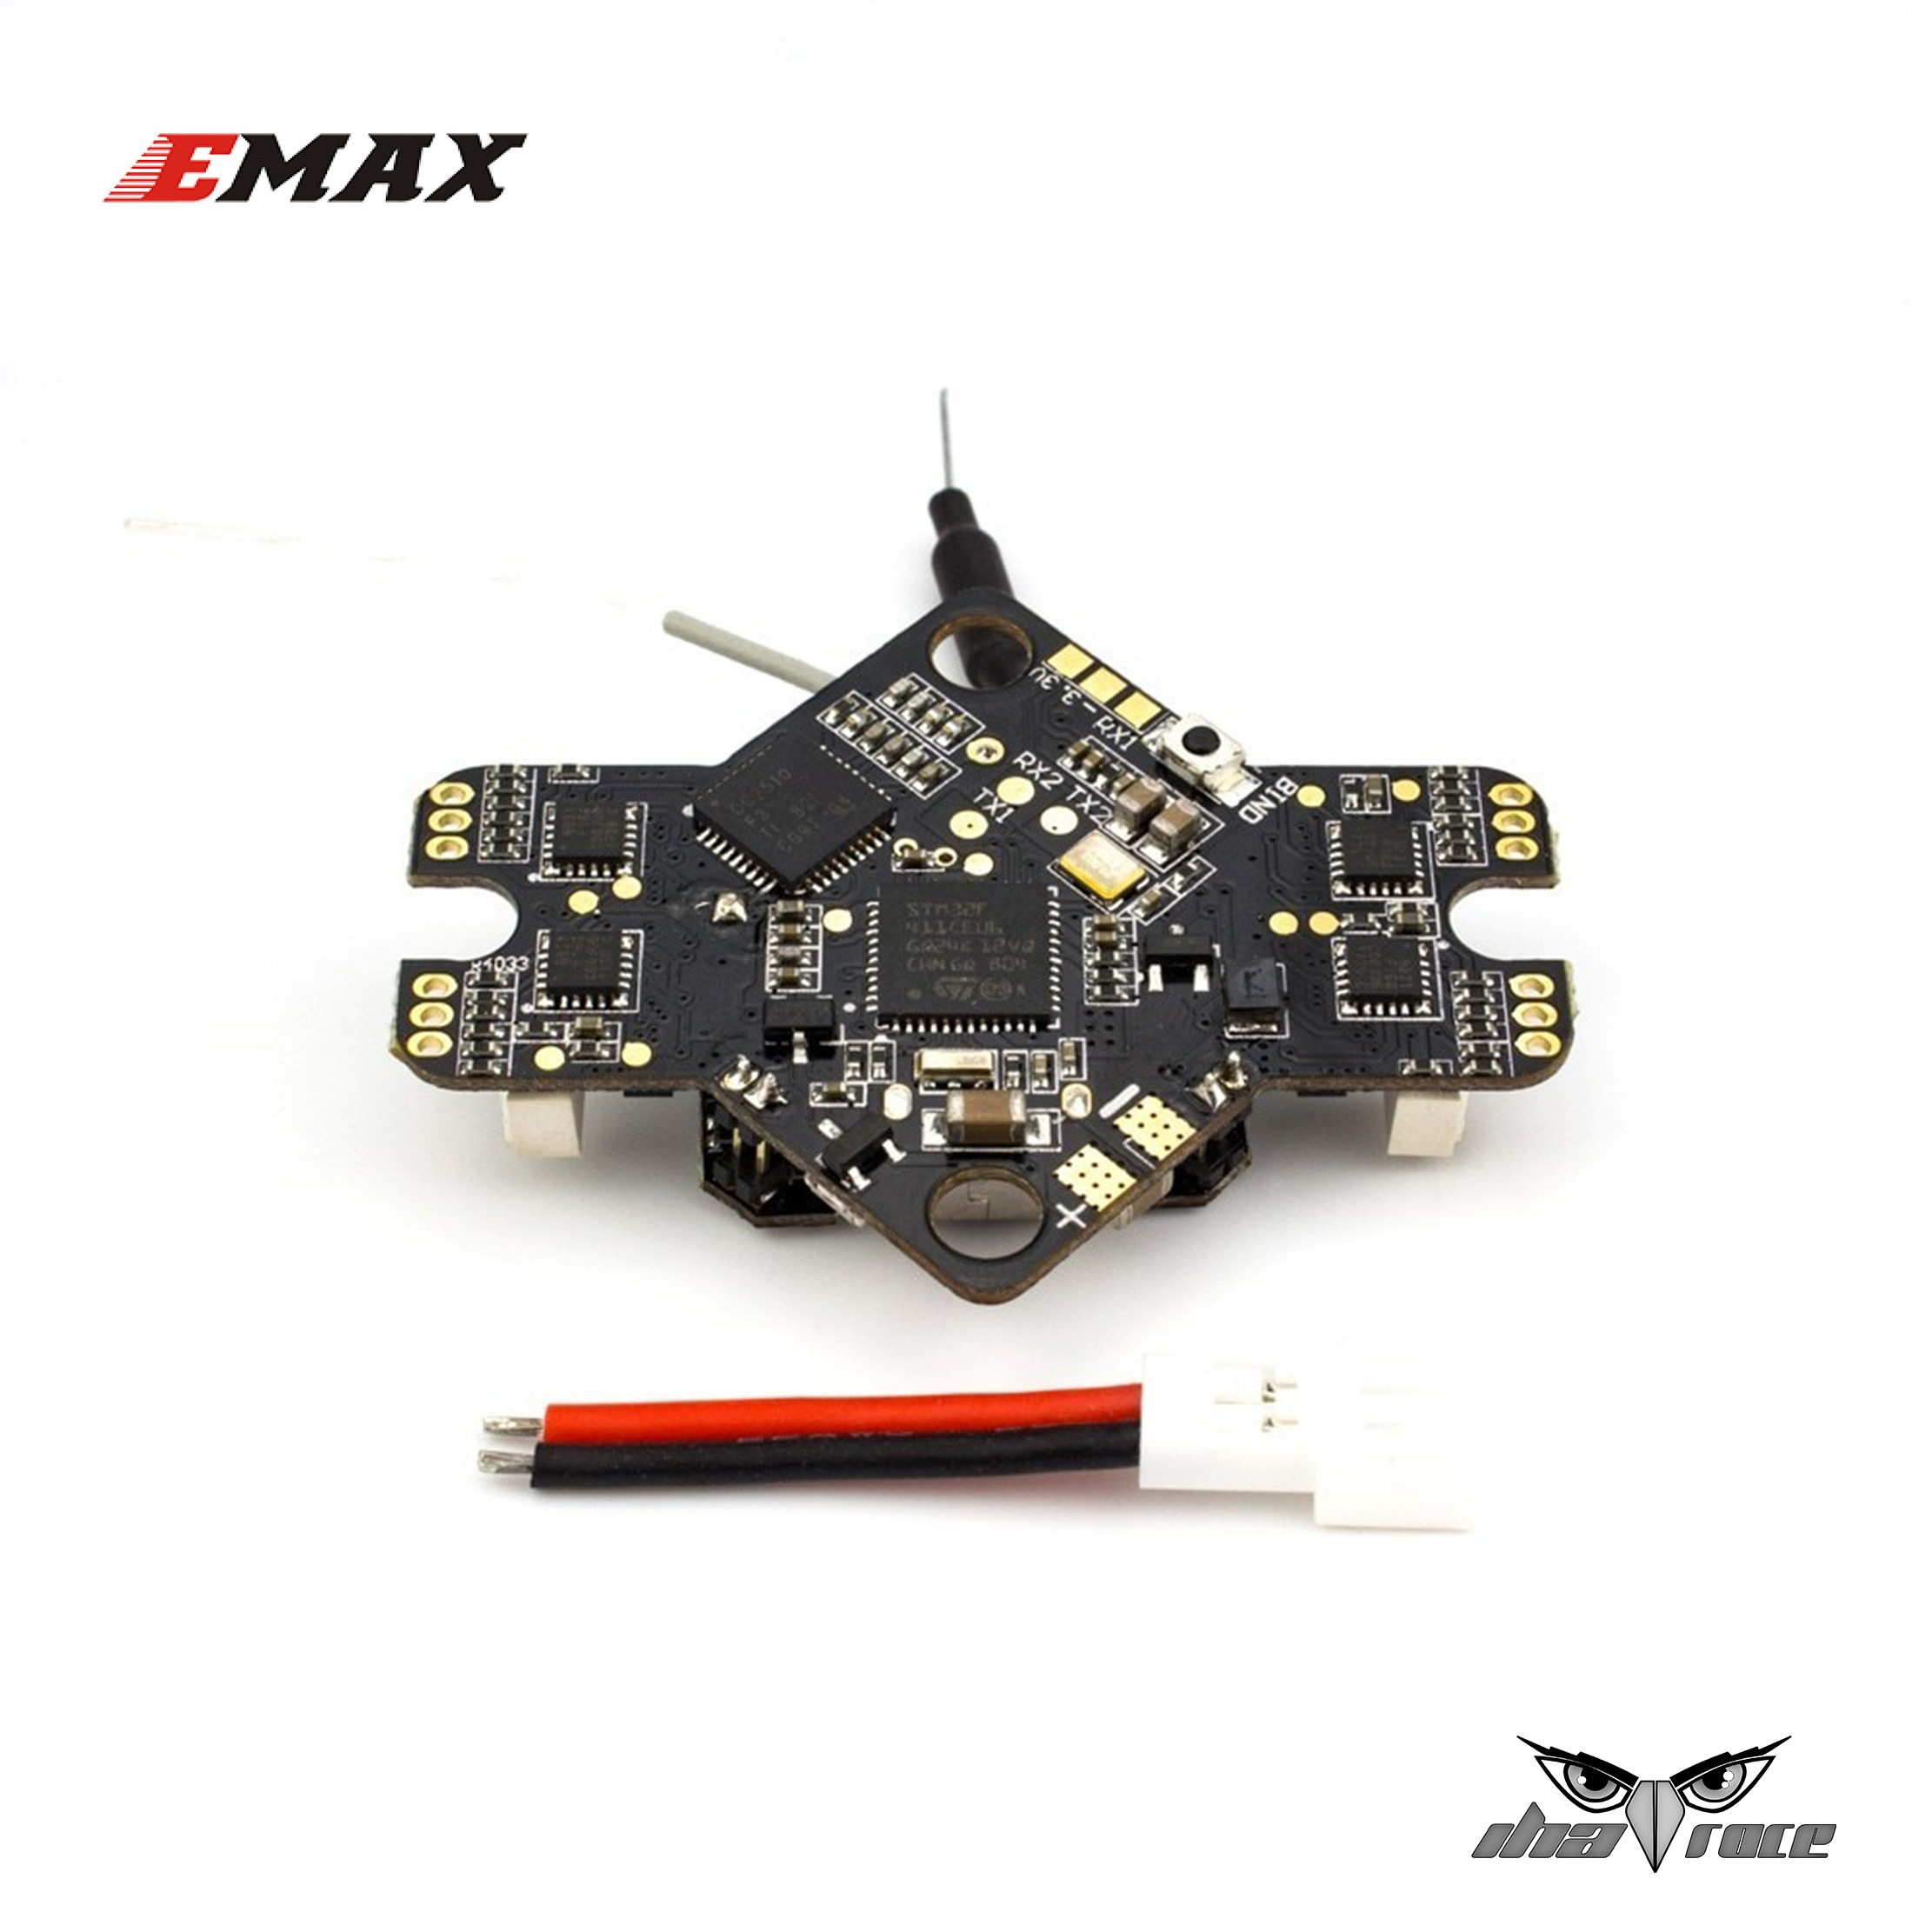 emax-control-vuelo-aiovtxrx-para-tinyhawk